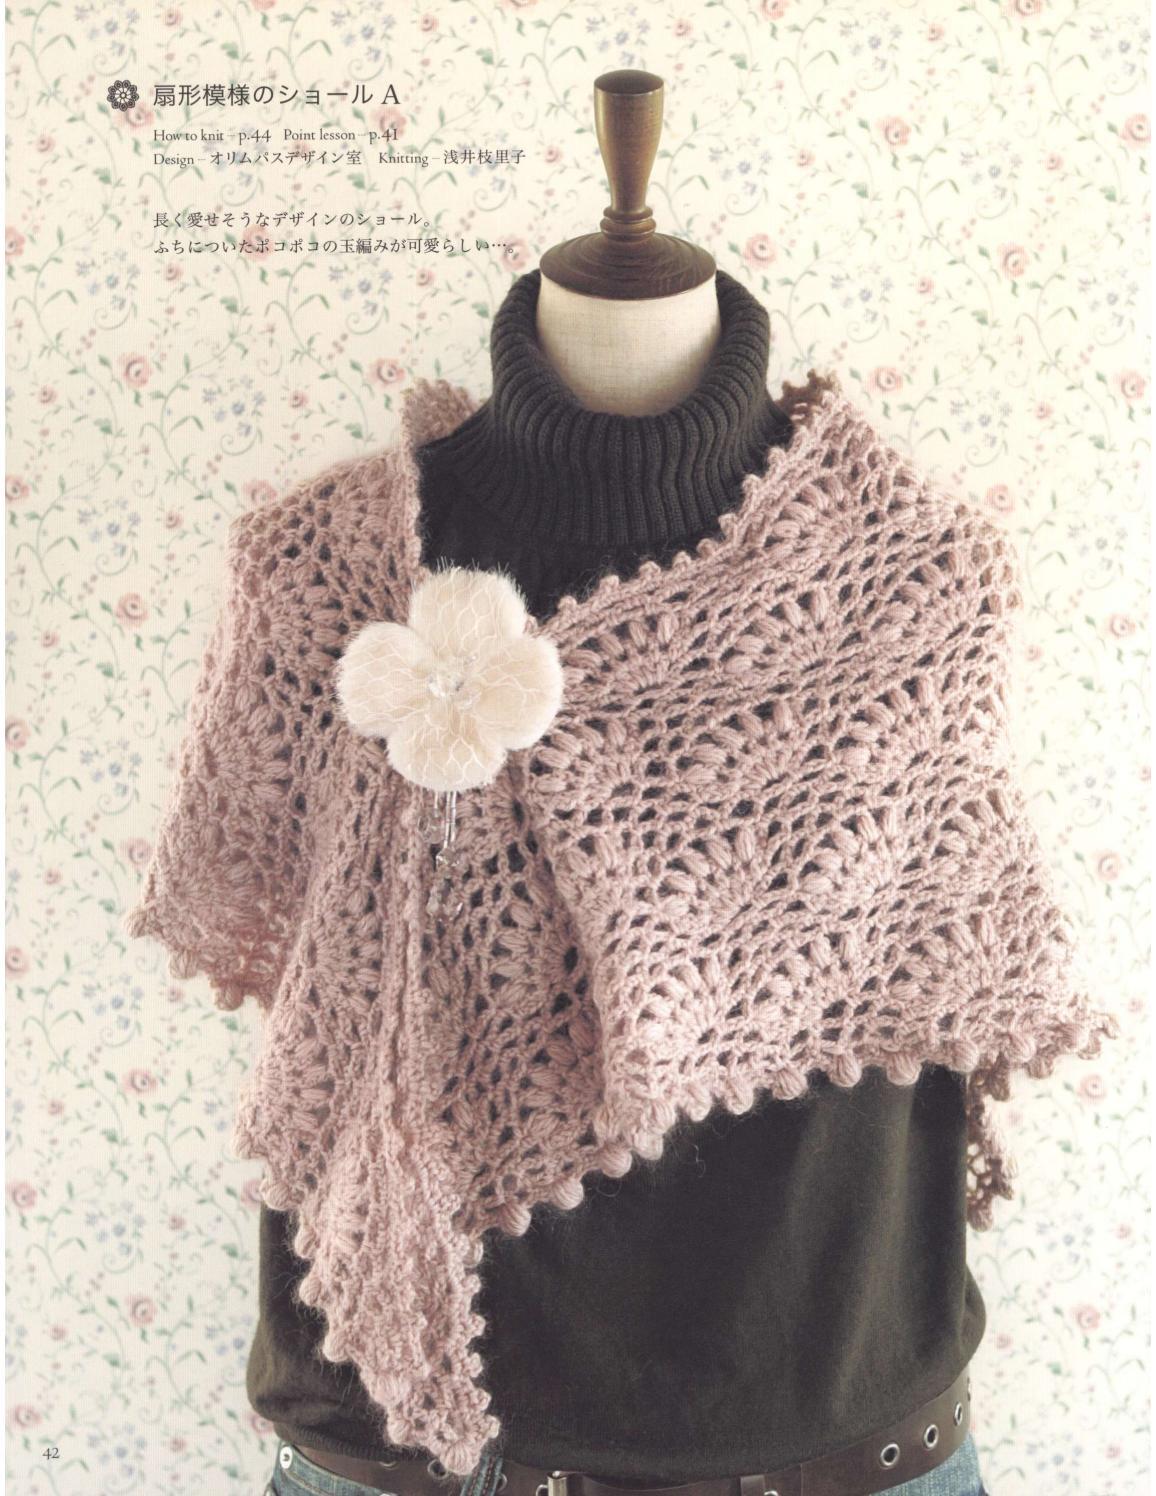 Asahi original crochet best selection 2012 page 42